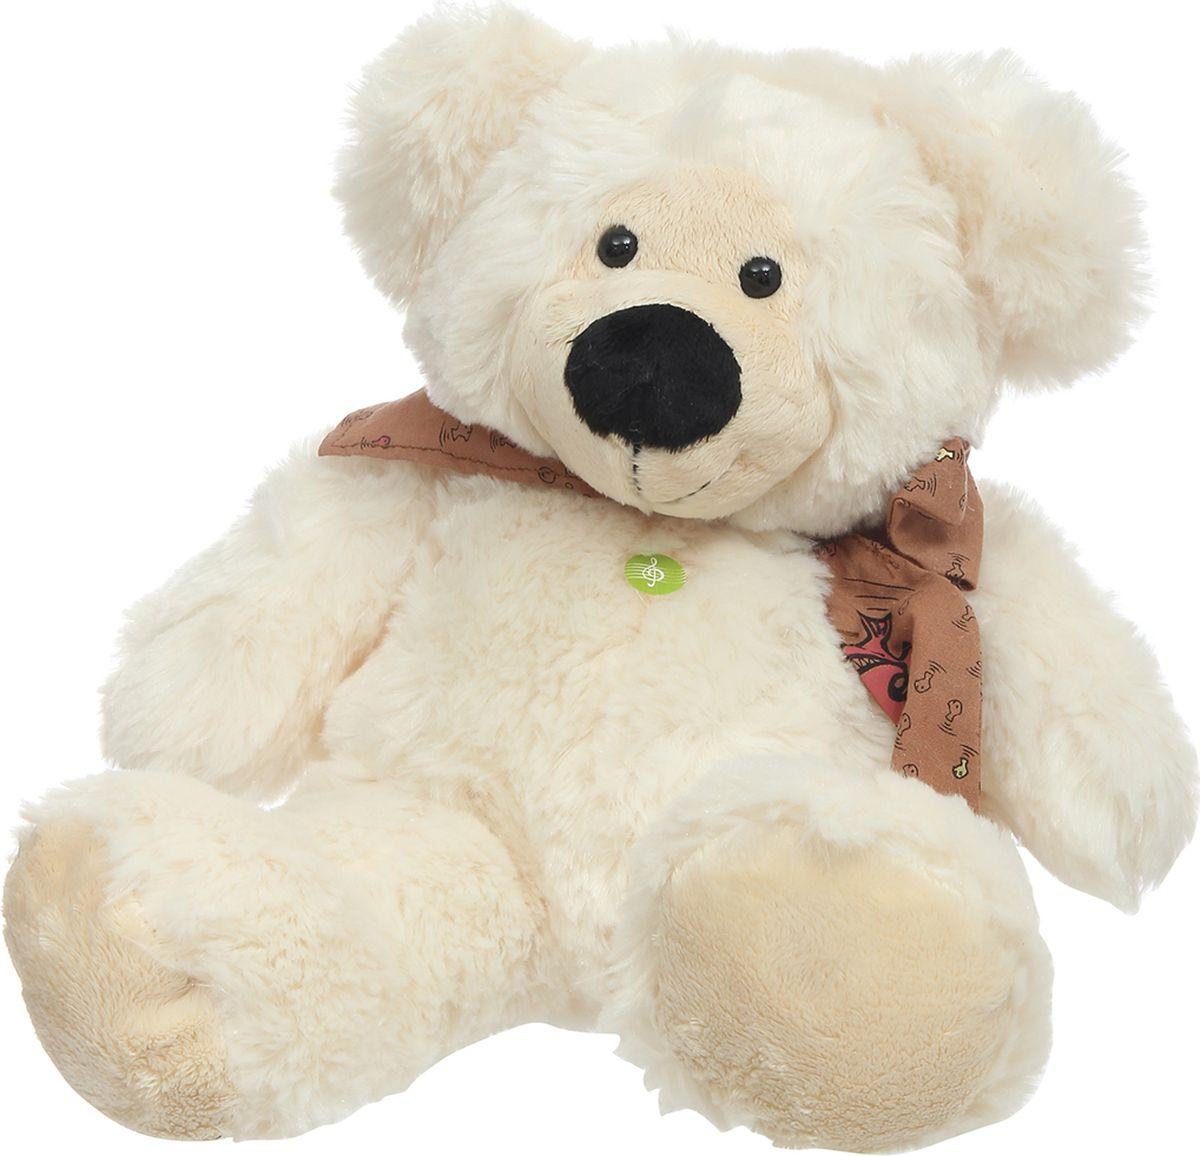 Plush Apple Мягкая игрушка Медведь Артемка 38 см мягкая игрушка plush apple собака с шарфом 28 см